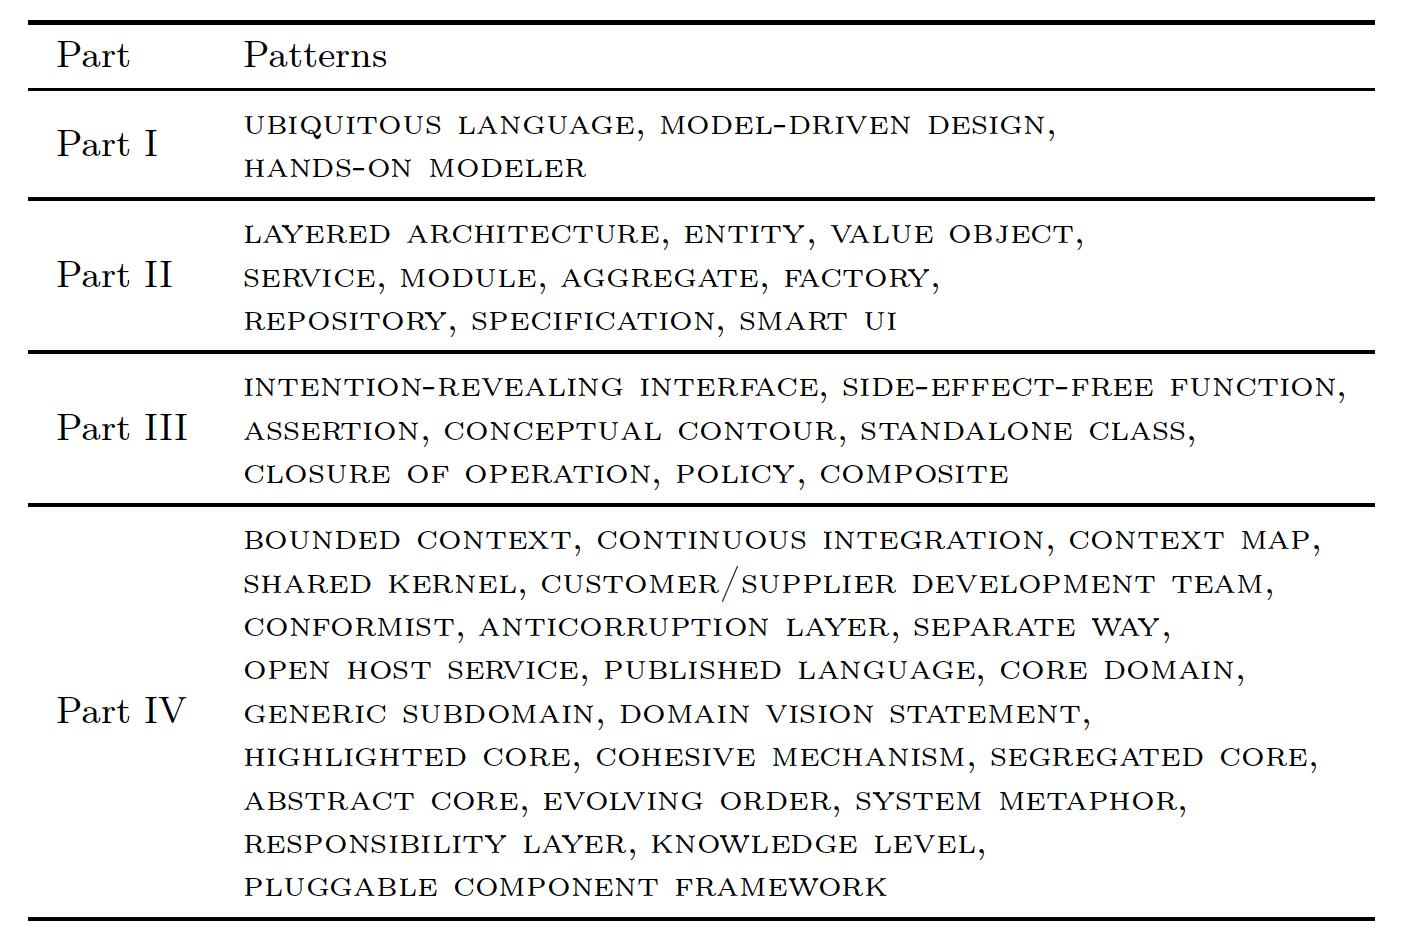 Patterns in the DDD book